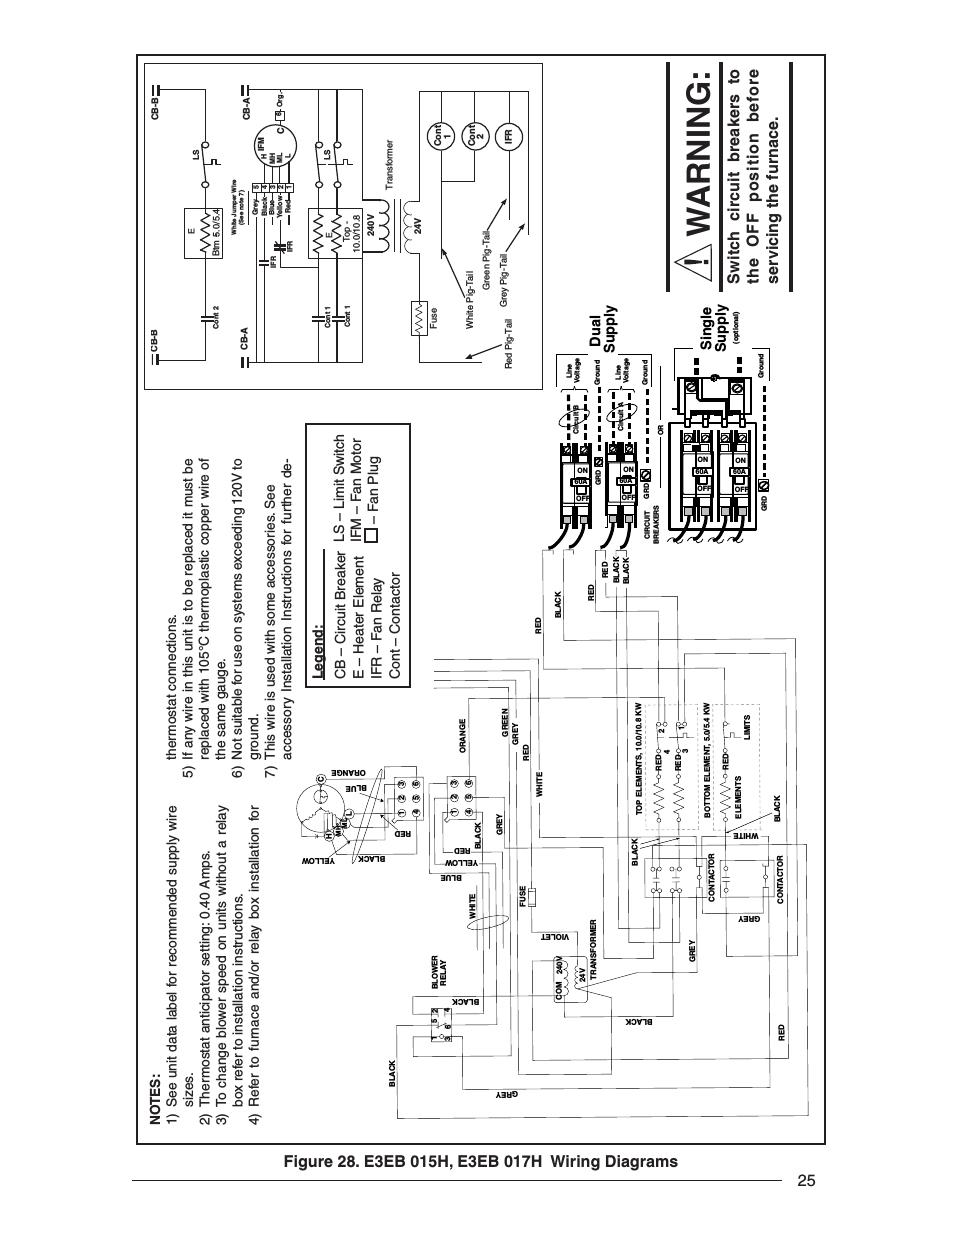 Intertherm Furnace Wiring Diagram E2eb 015h 2004 Suburban Fuse Box Podewiring Yenpancane Jeanjaures37 Fr